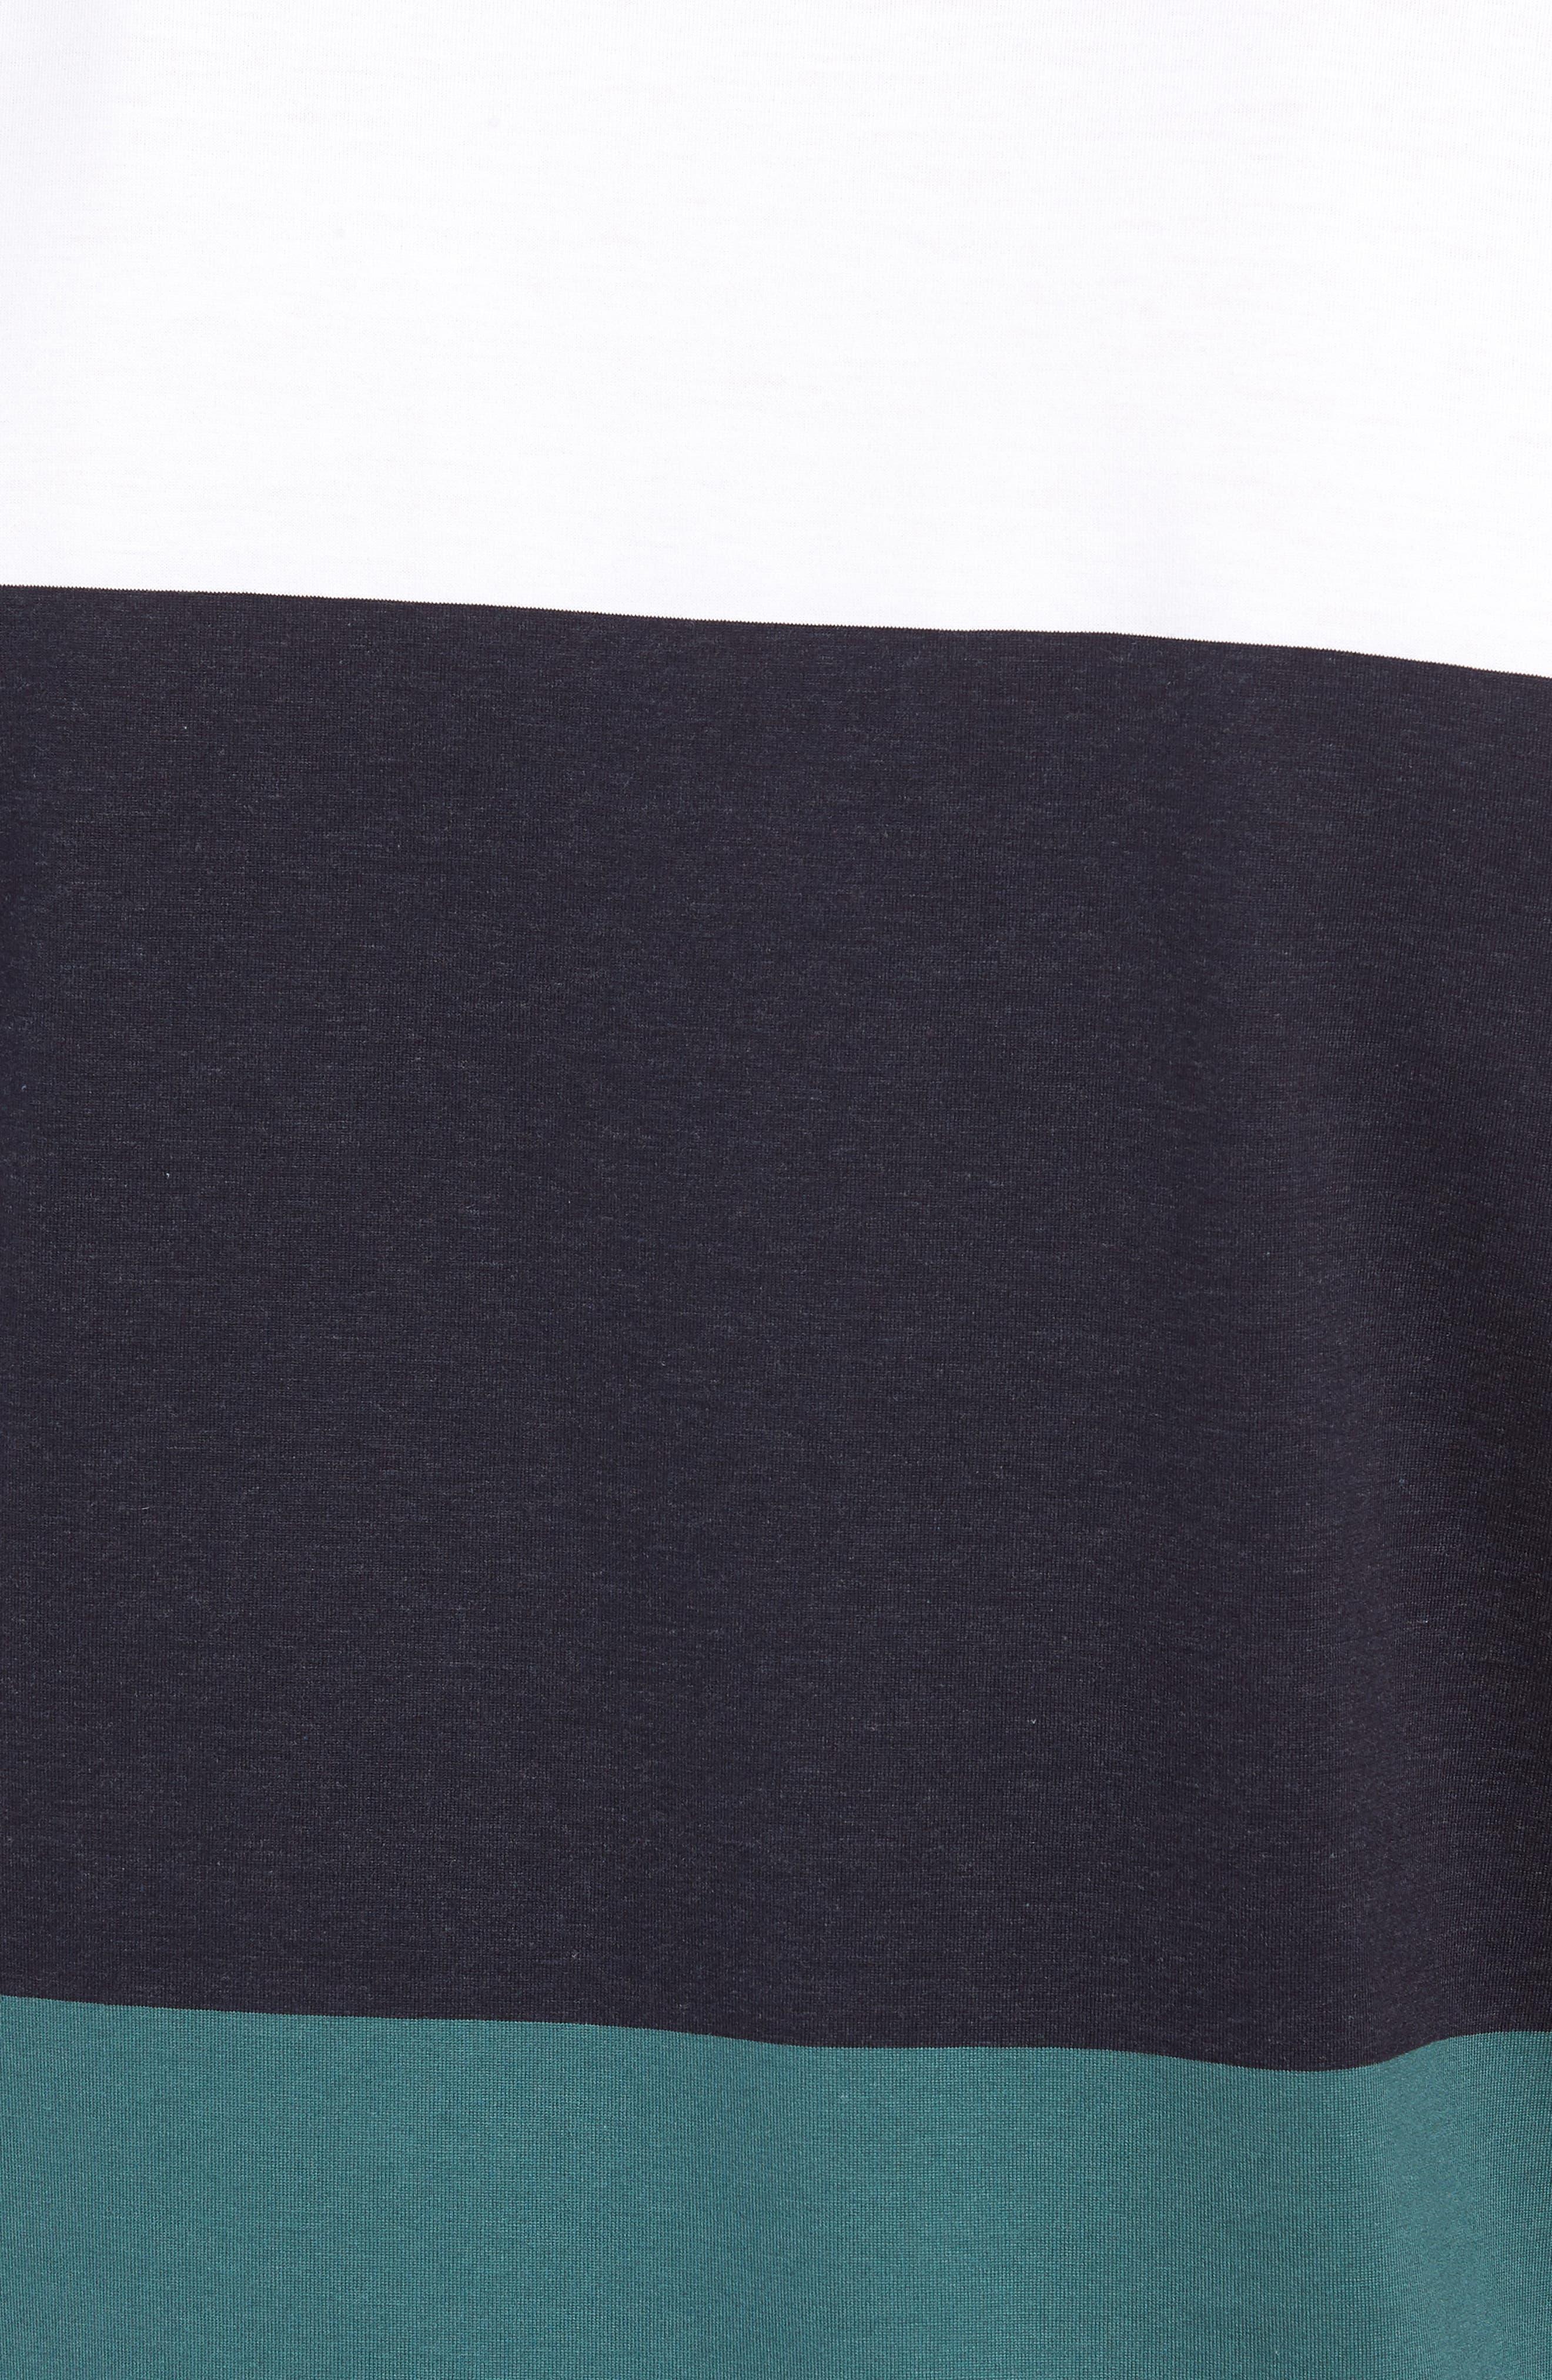 Tessler Colorblock Slim Fit T-Shirt,                             Alternate thumbnail 5, color,                             BLUE